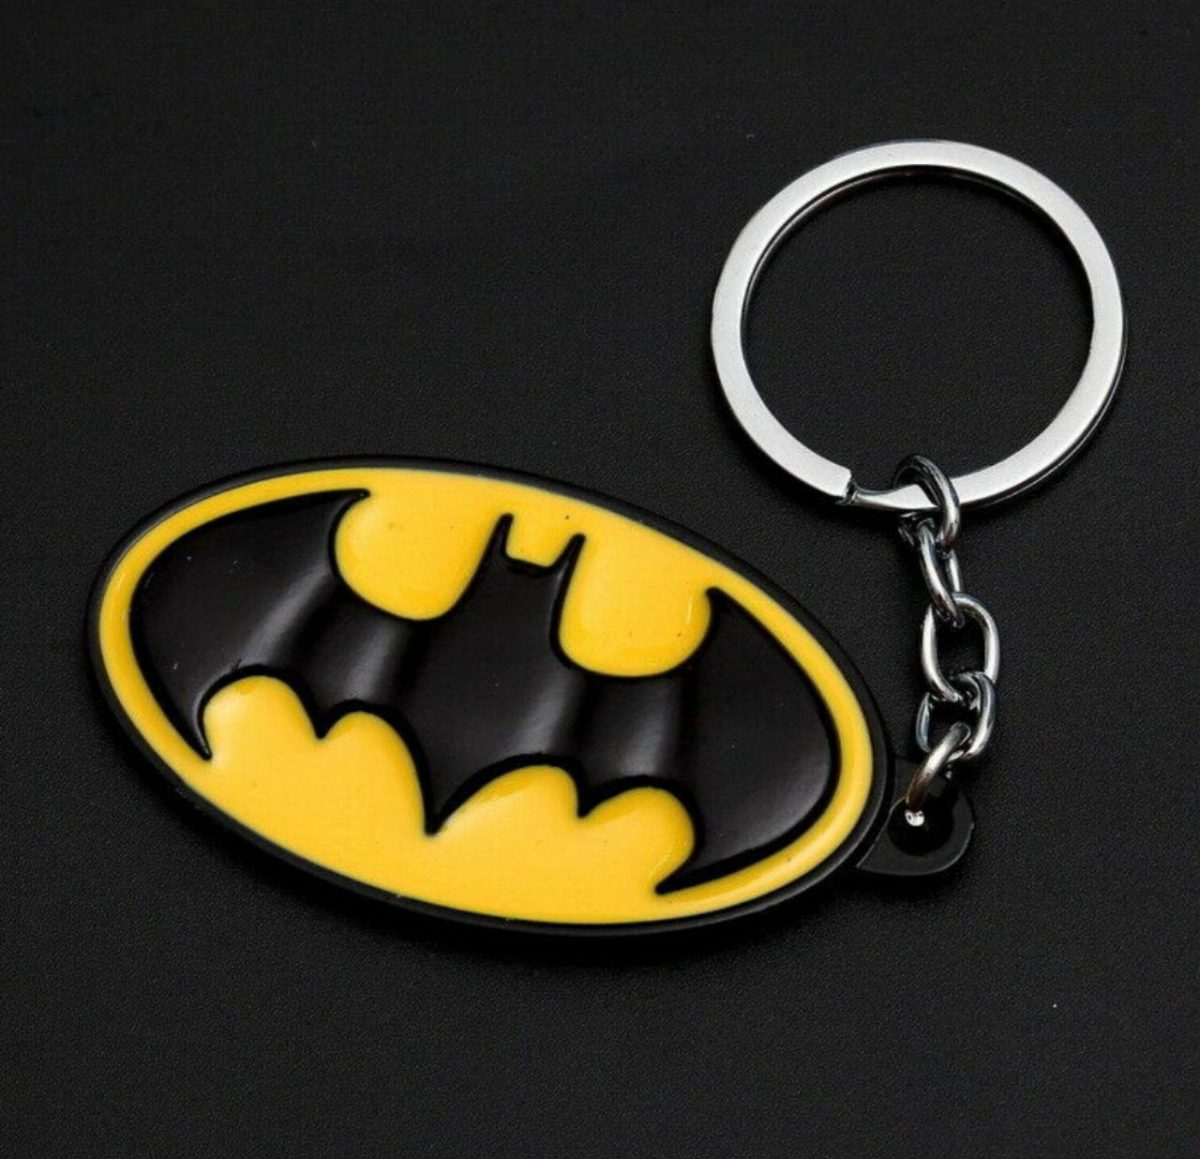 batman-keychain-product-pasazhonline-product